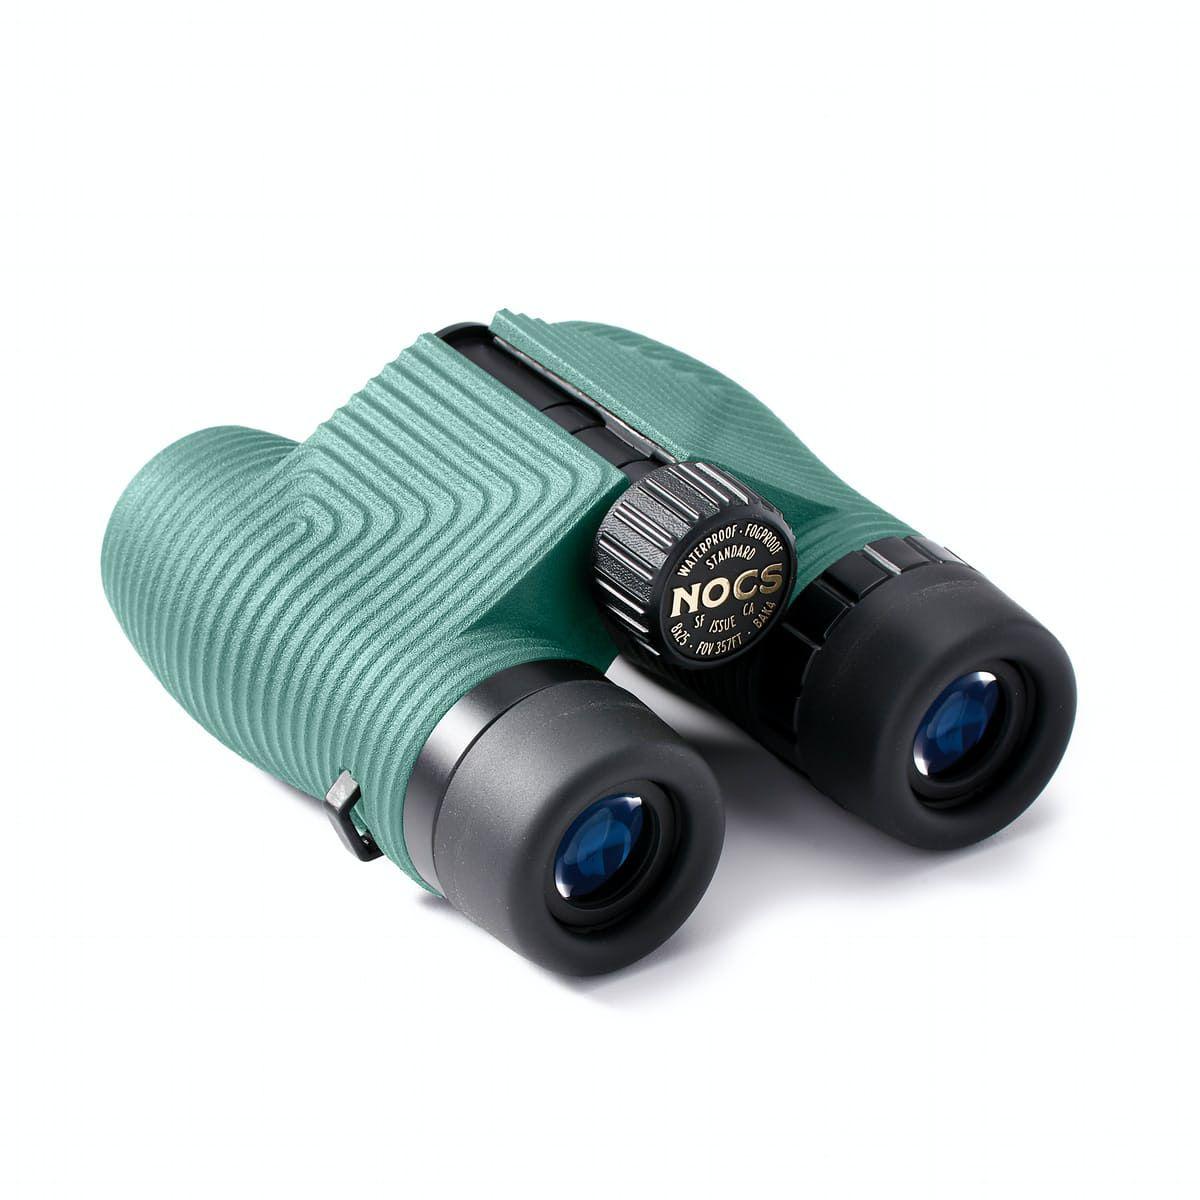 Nocs Provision Standard Issue 8x25 Binoculars